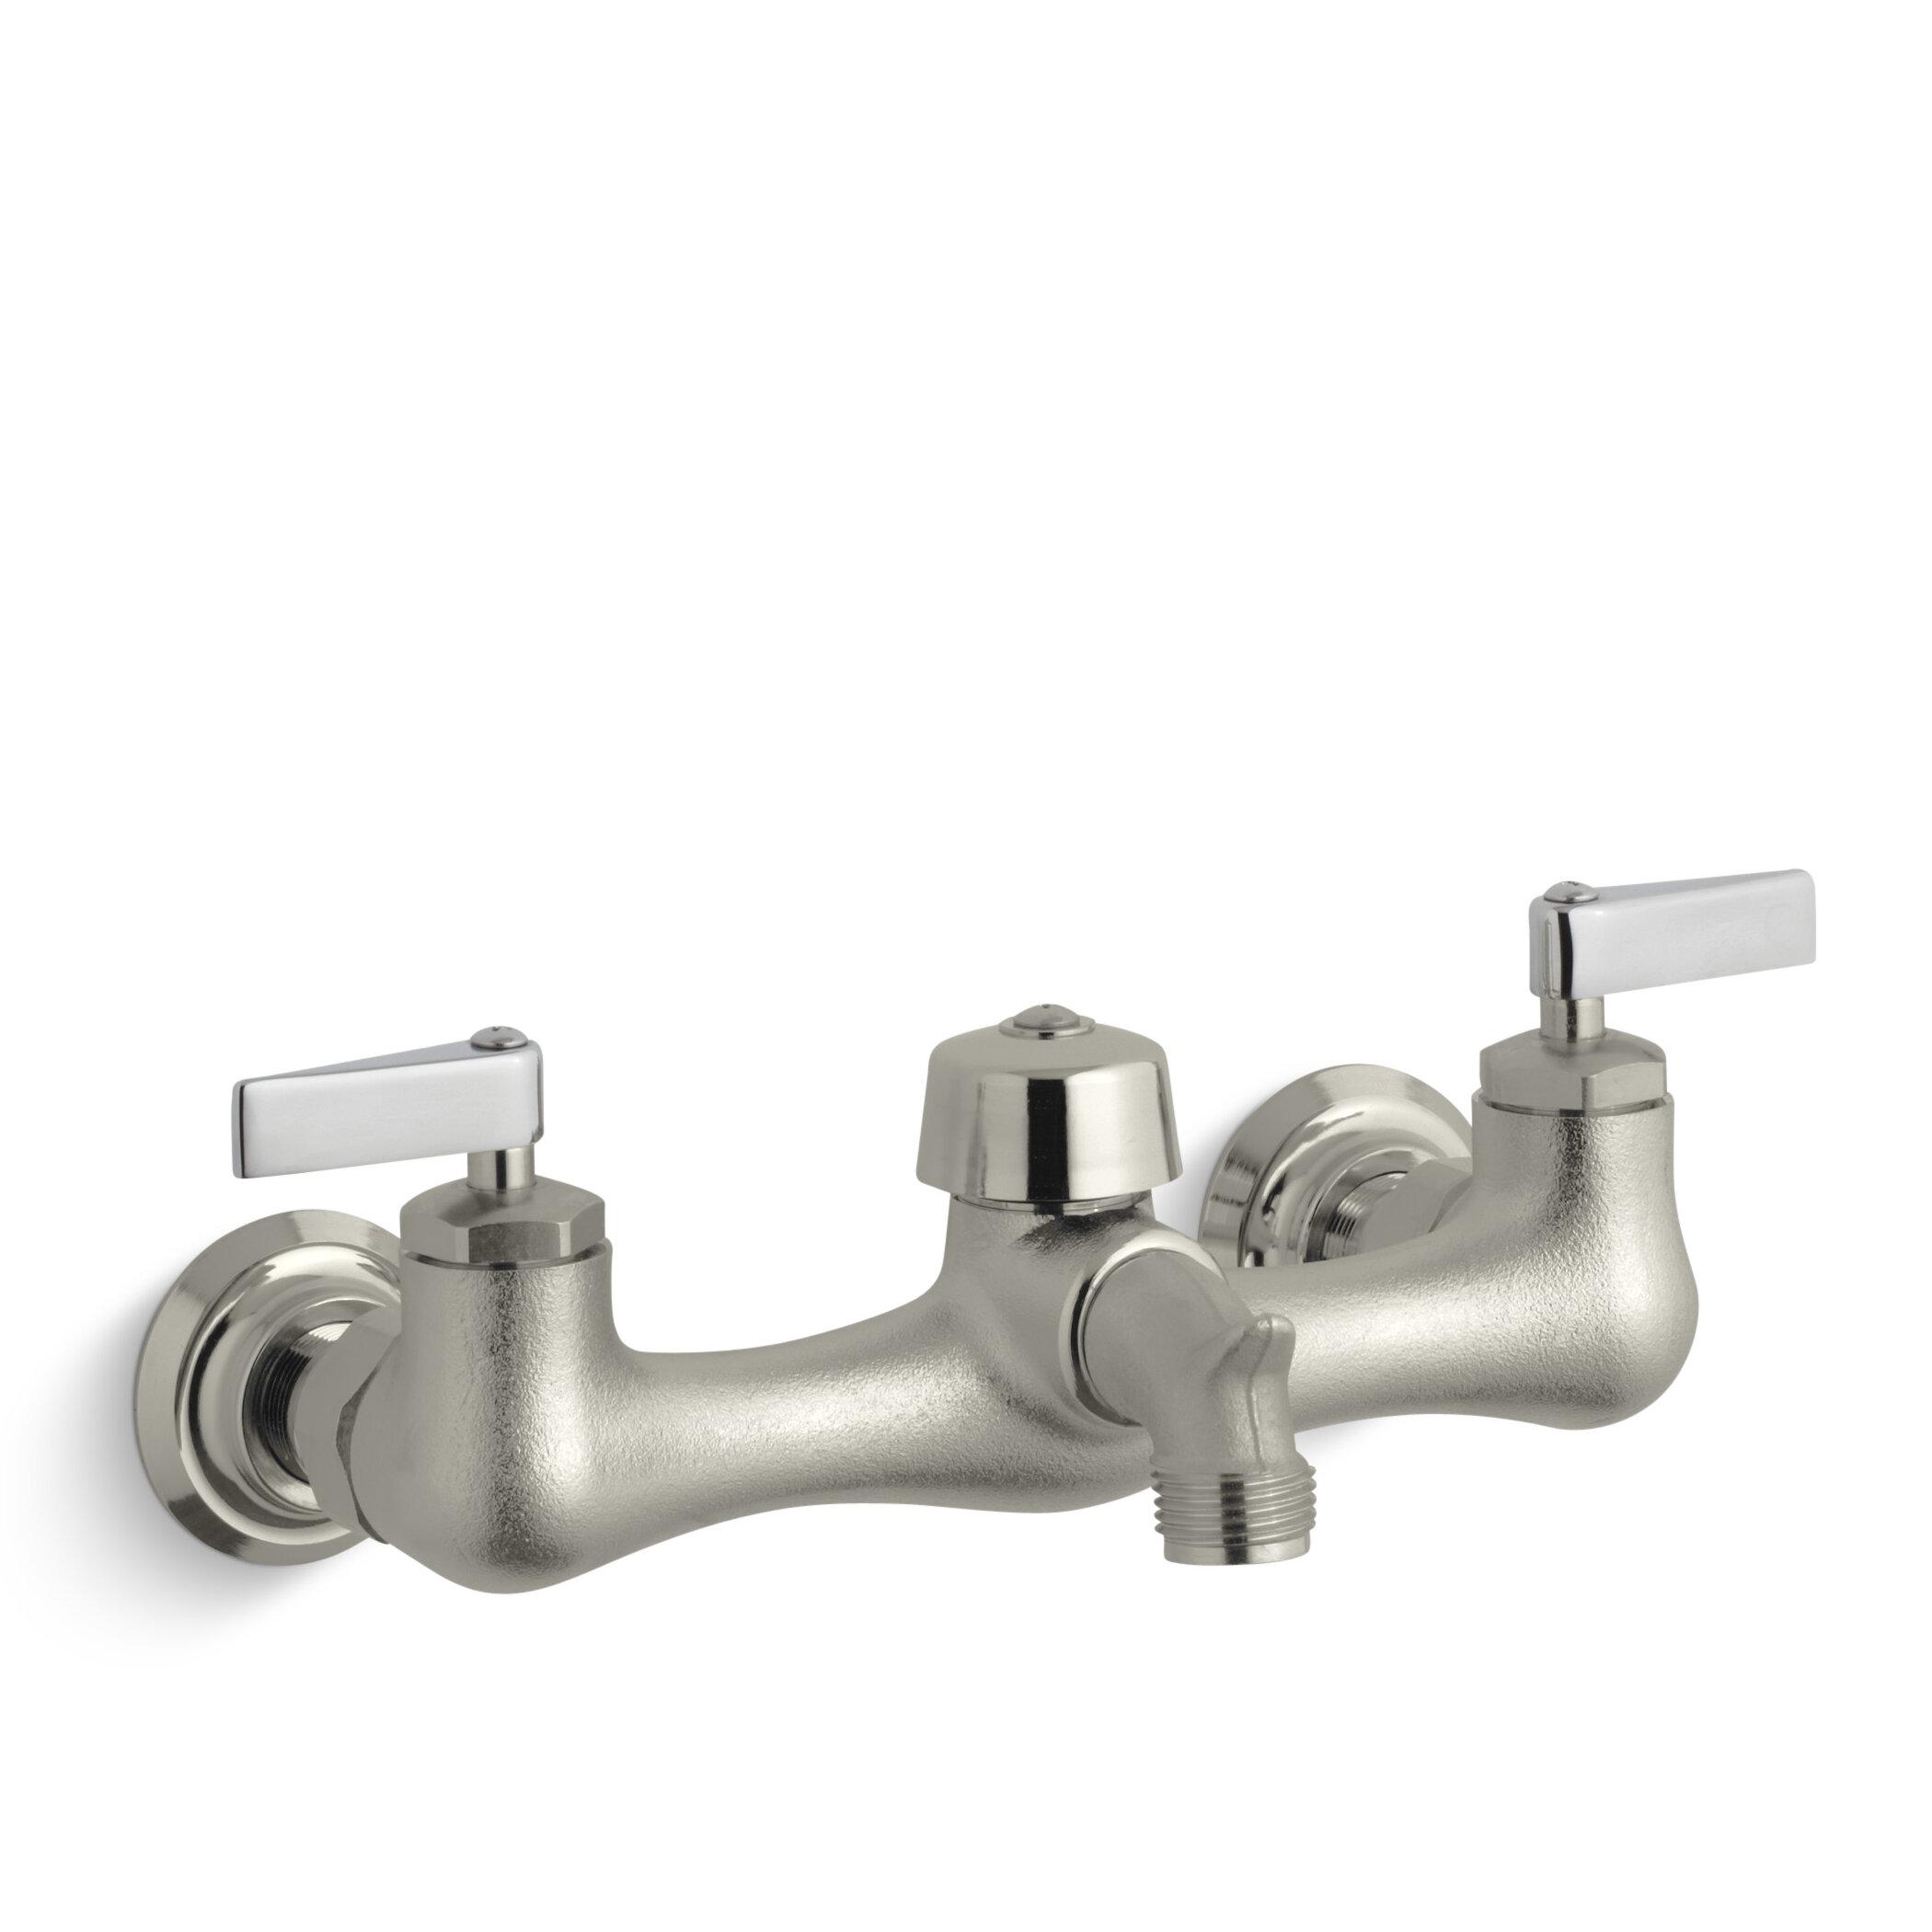 K-8905-CP,RP Kohler Knoxford Double Lever Handle Service Sink Faucet ...